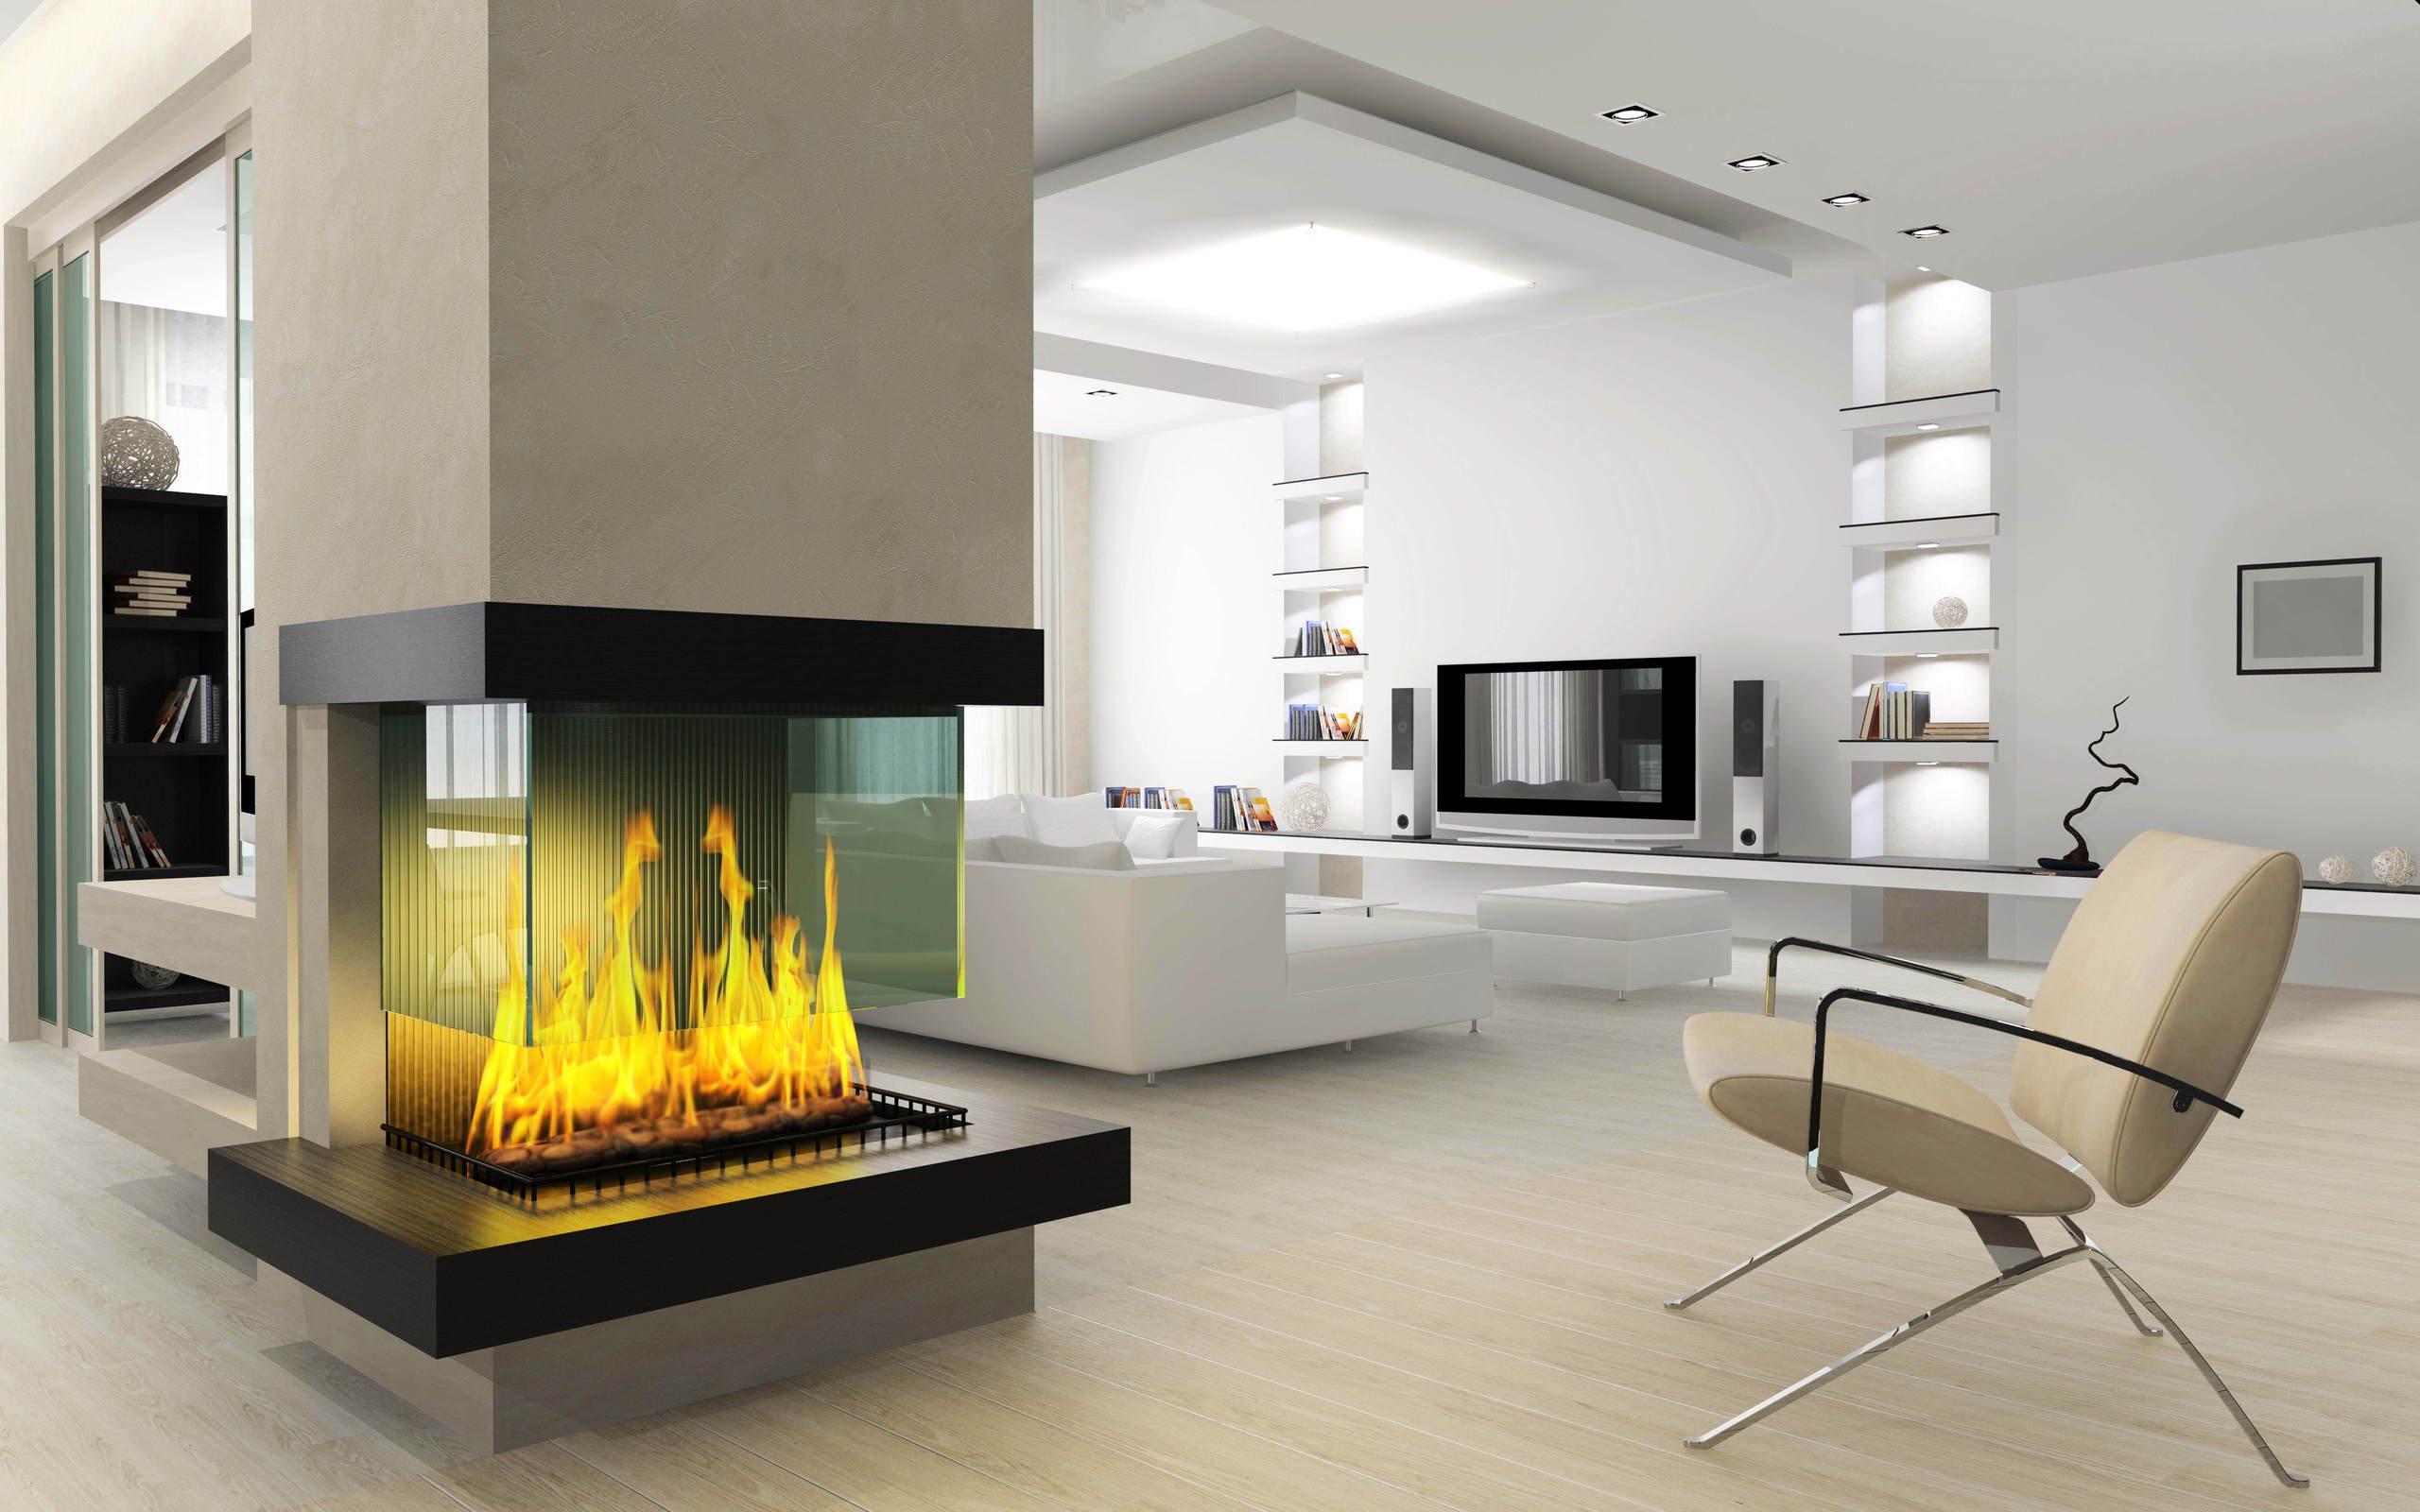 91 interior designer los angeles modern cannell and for Interior design los angeles